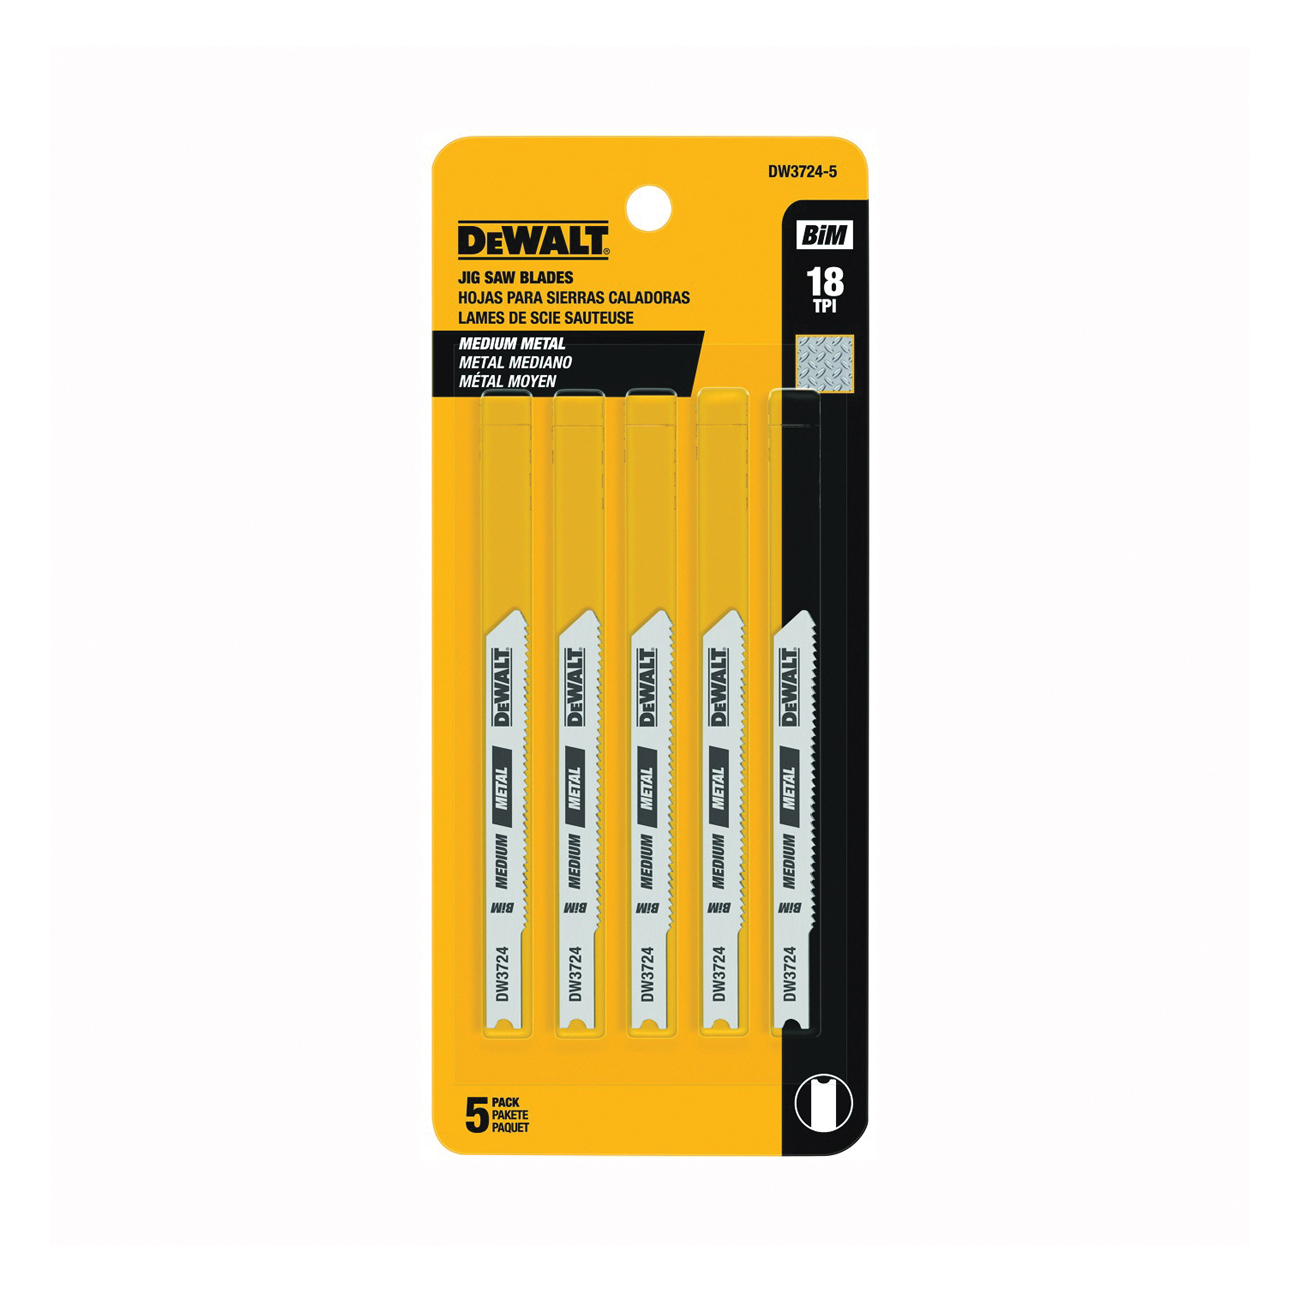 Picture of DeWALT DW3724-5 Jig Saw Blade, 0.3 in W, 18 TPI